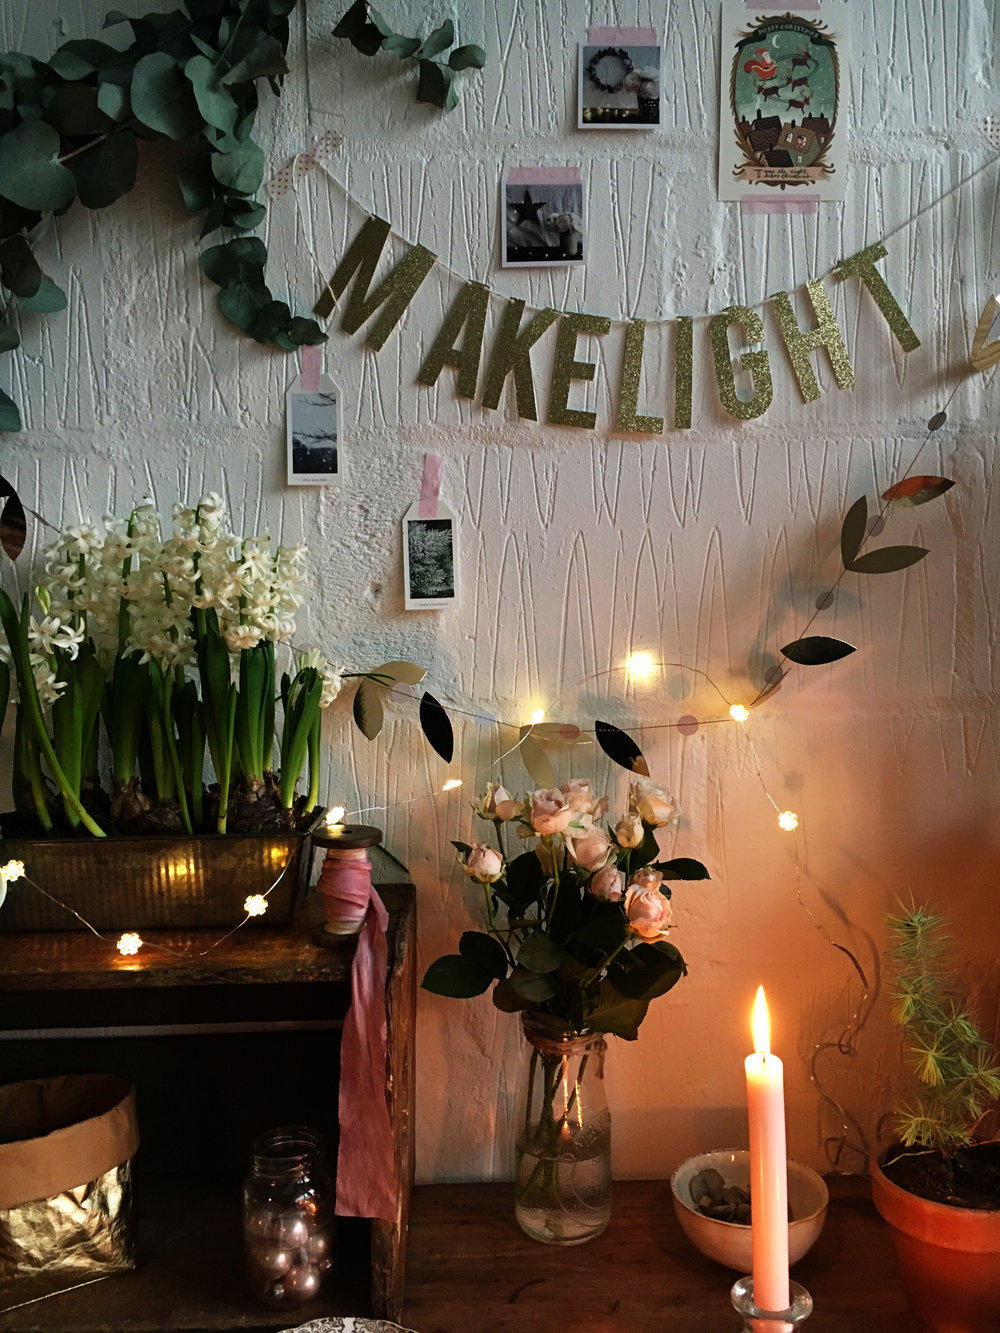 Makelight Live Christmas Workshop